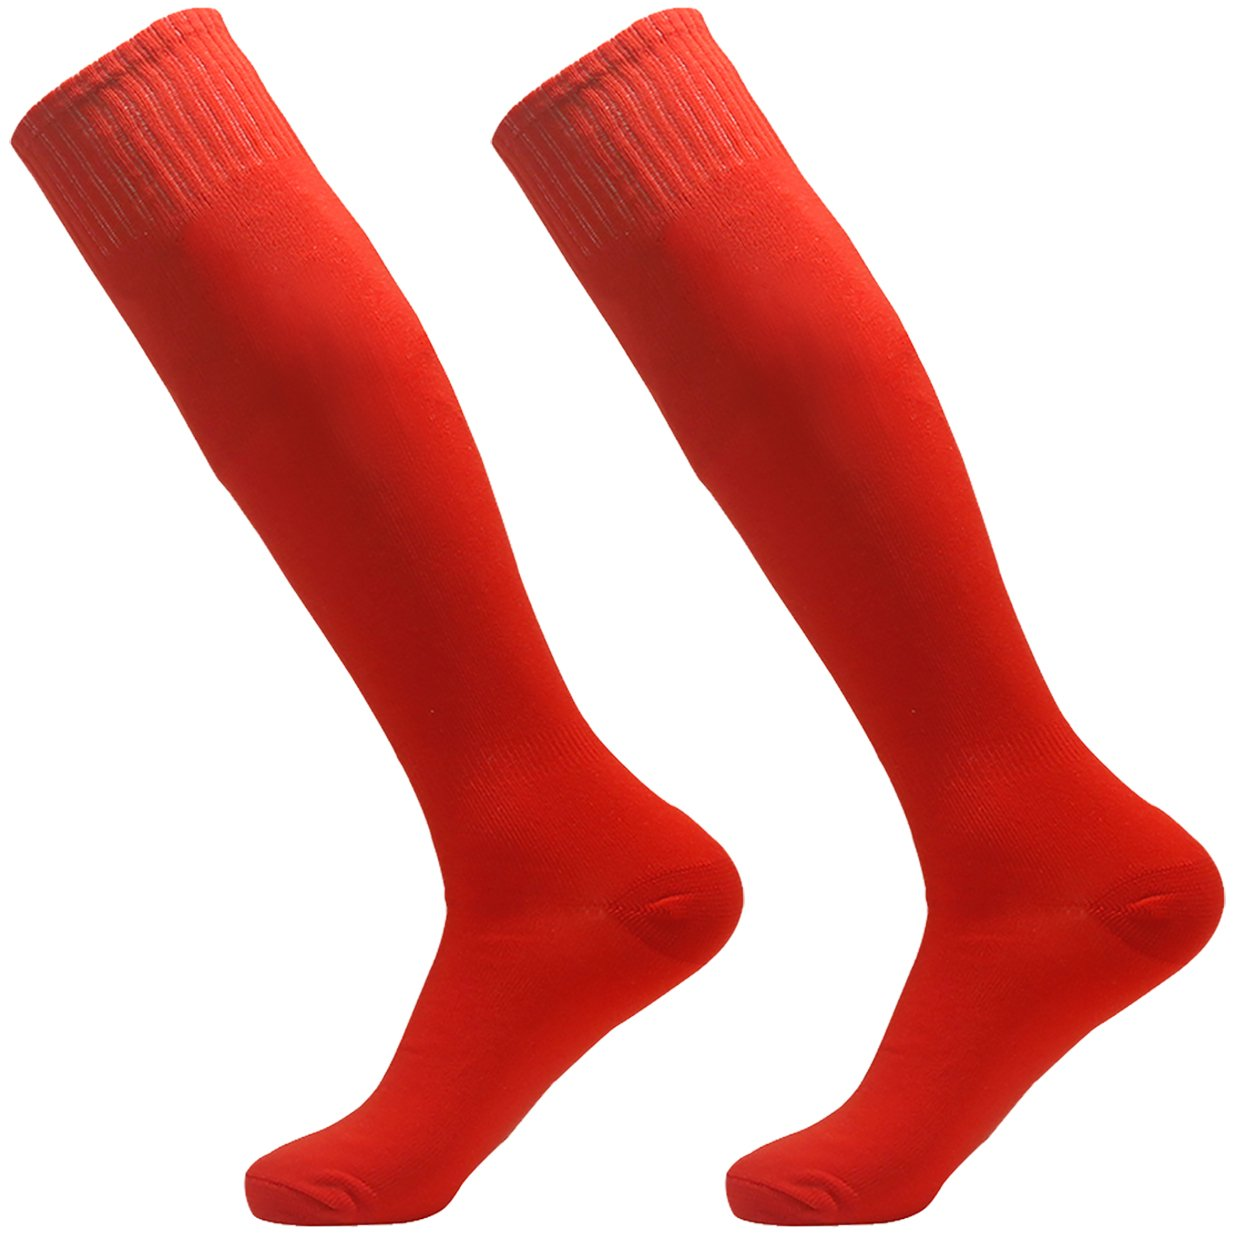 Tattooサッカーソックス、3streetユニセックスニーハイプリントチューブソックス2 / 6ペア B076BJRVGR 00001#2-Pairs Red 00001#2-Pairs Red